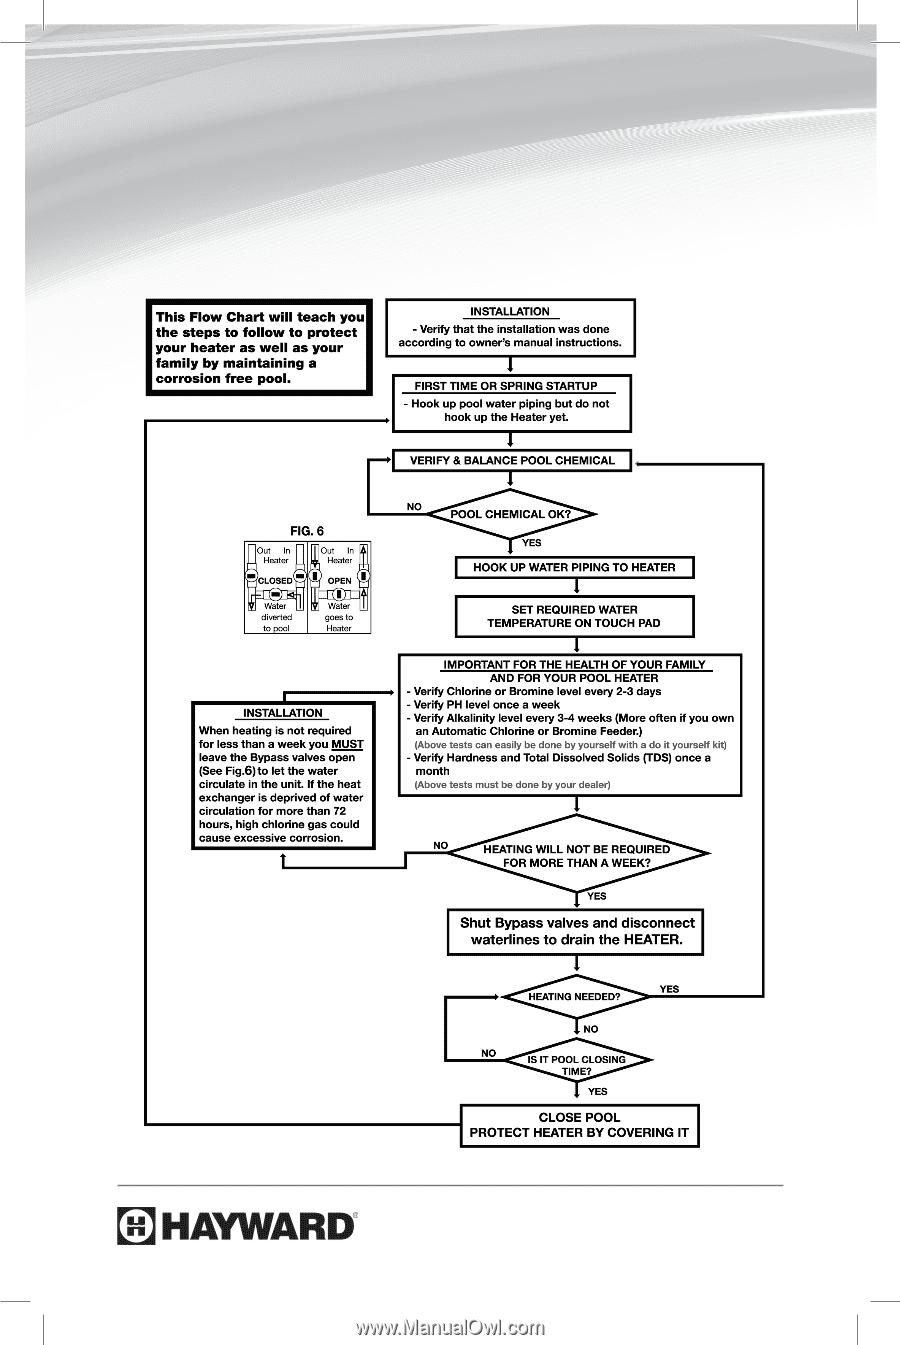 appuntamenti decisioni